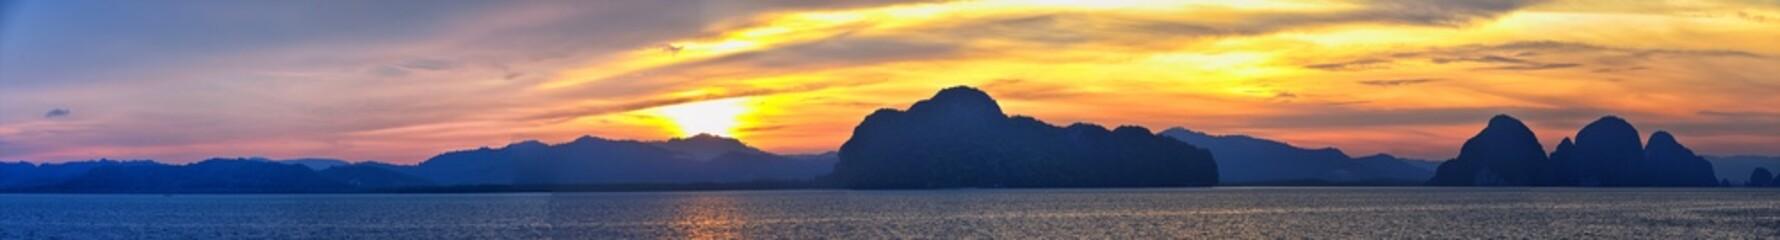 Islands Sunset, Ocean panorama views near Phuket with deep Red, Orange, Purple and Blue, mountains, twilight in Thailand. Including Phi Phi, Ko Rang Yai, Ko Li Pe and other islands. Asia.